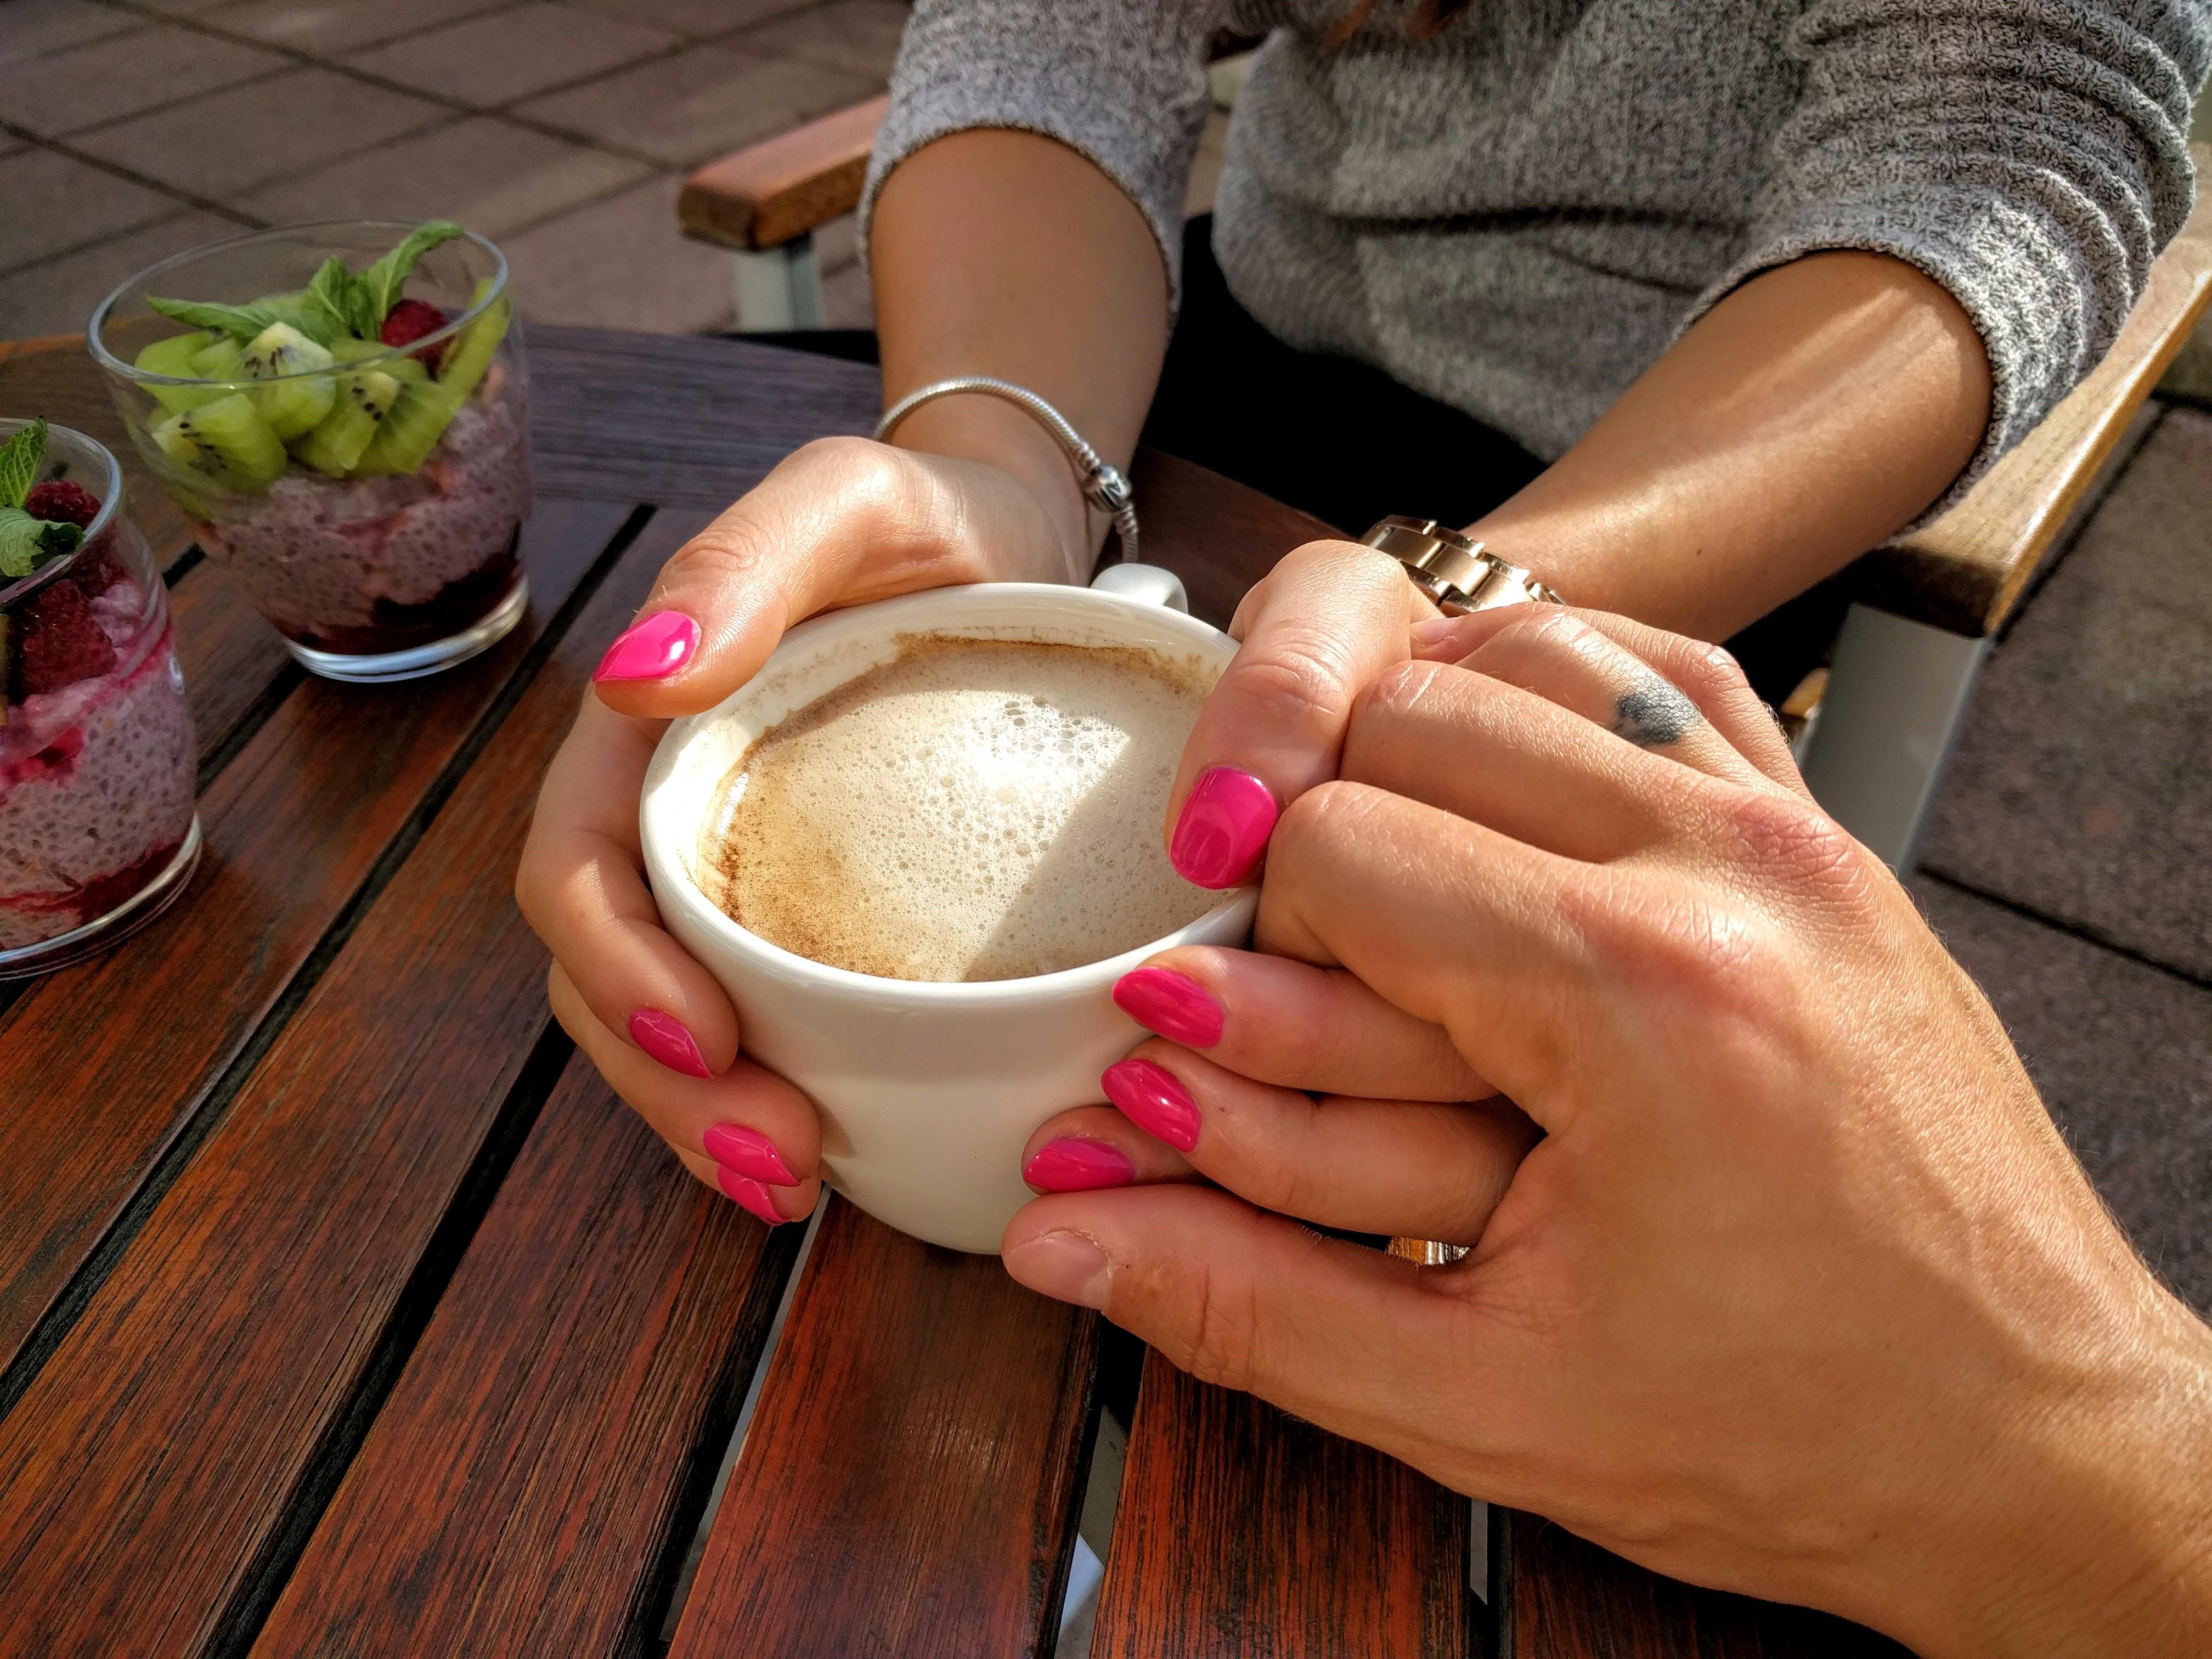 Wie giftig sind Nagellacke?